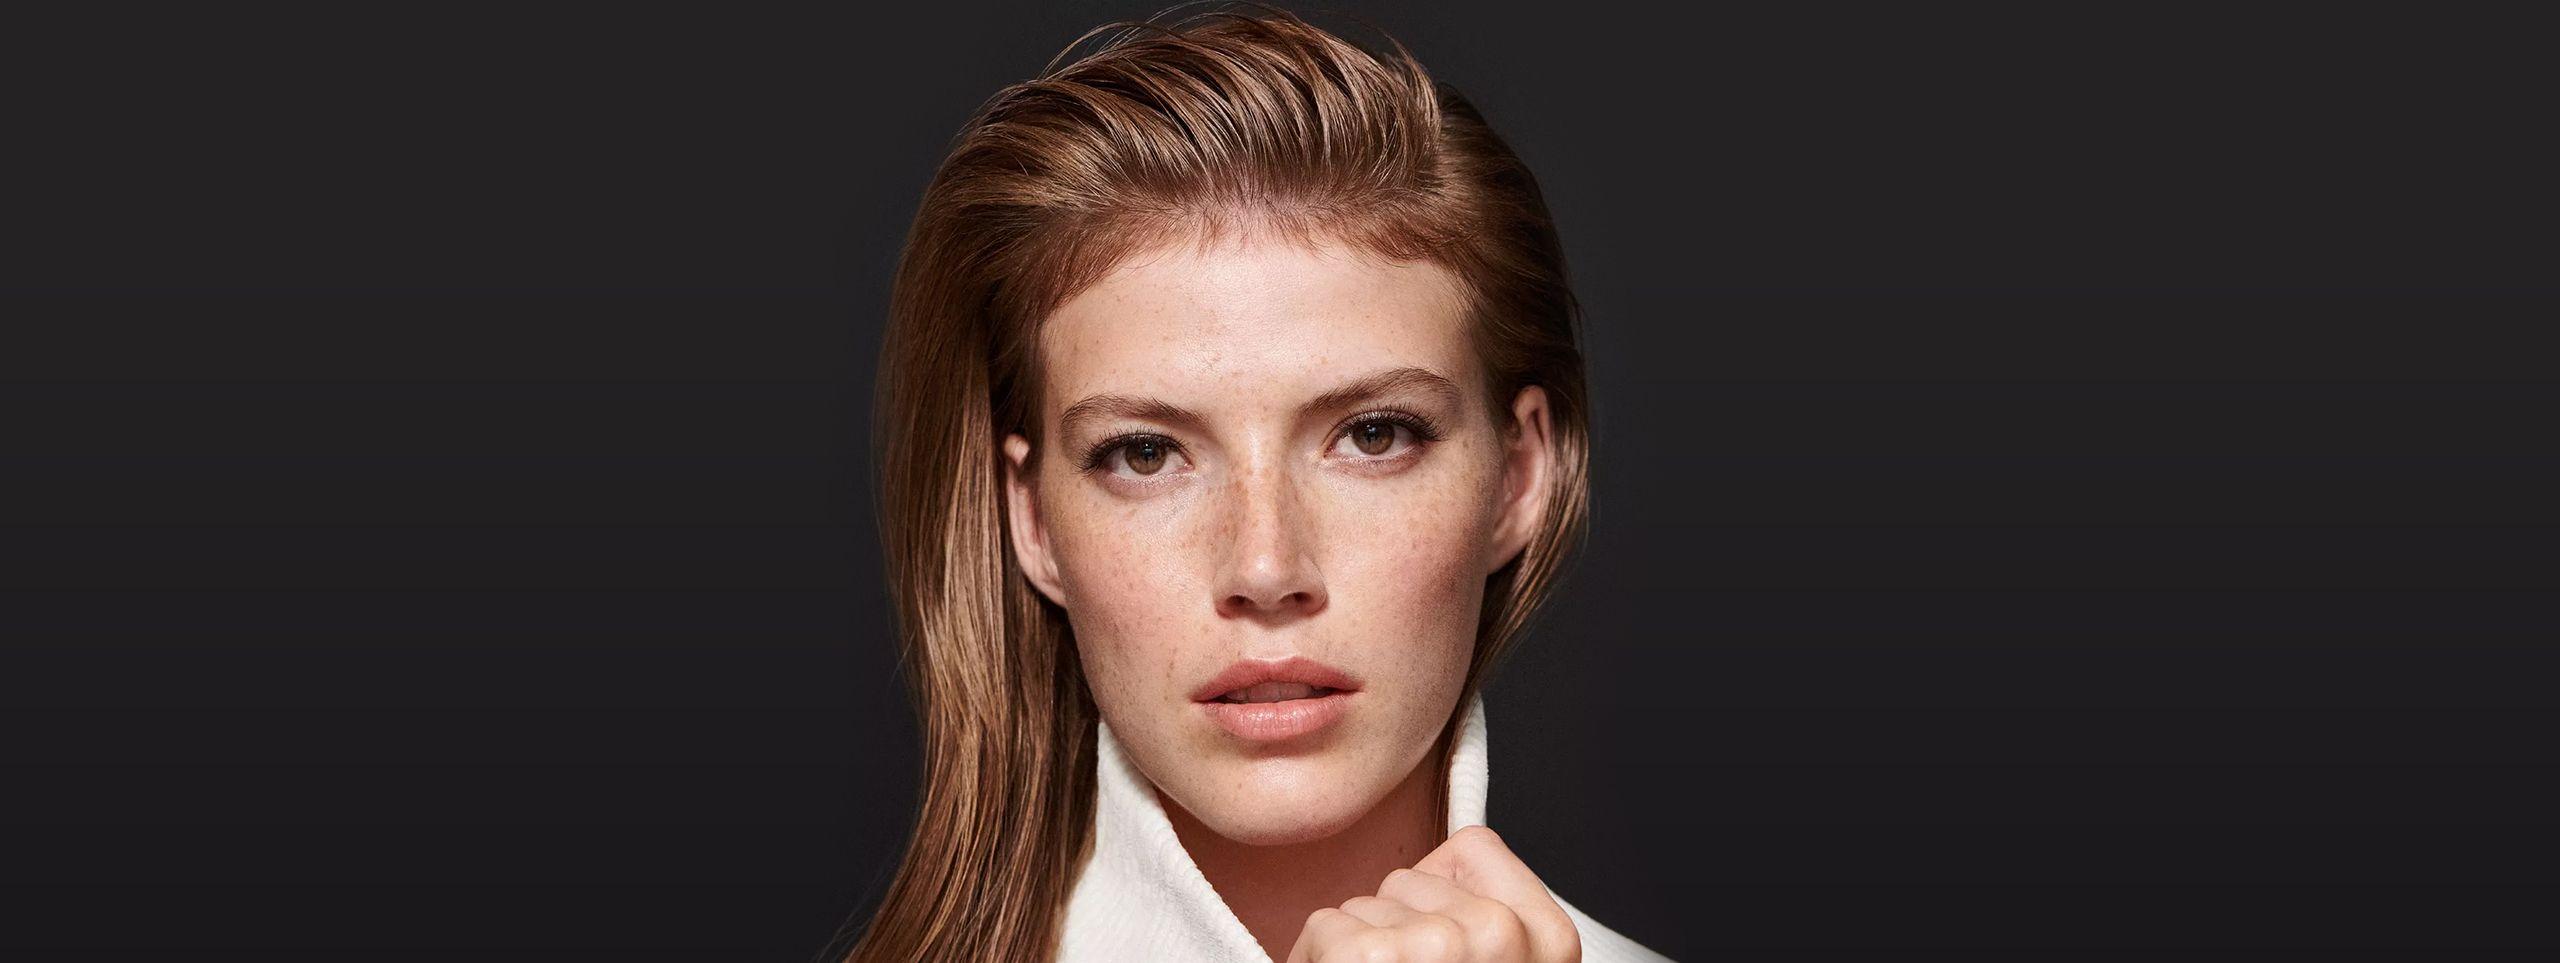 Woman with long sleek hair. Wet look.